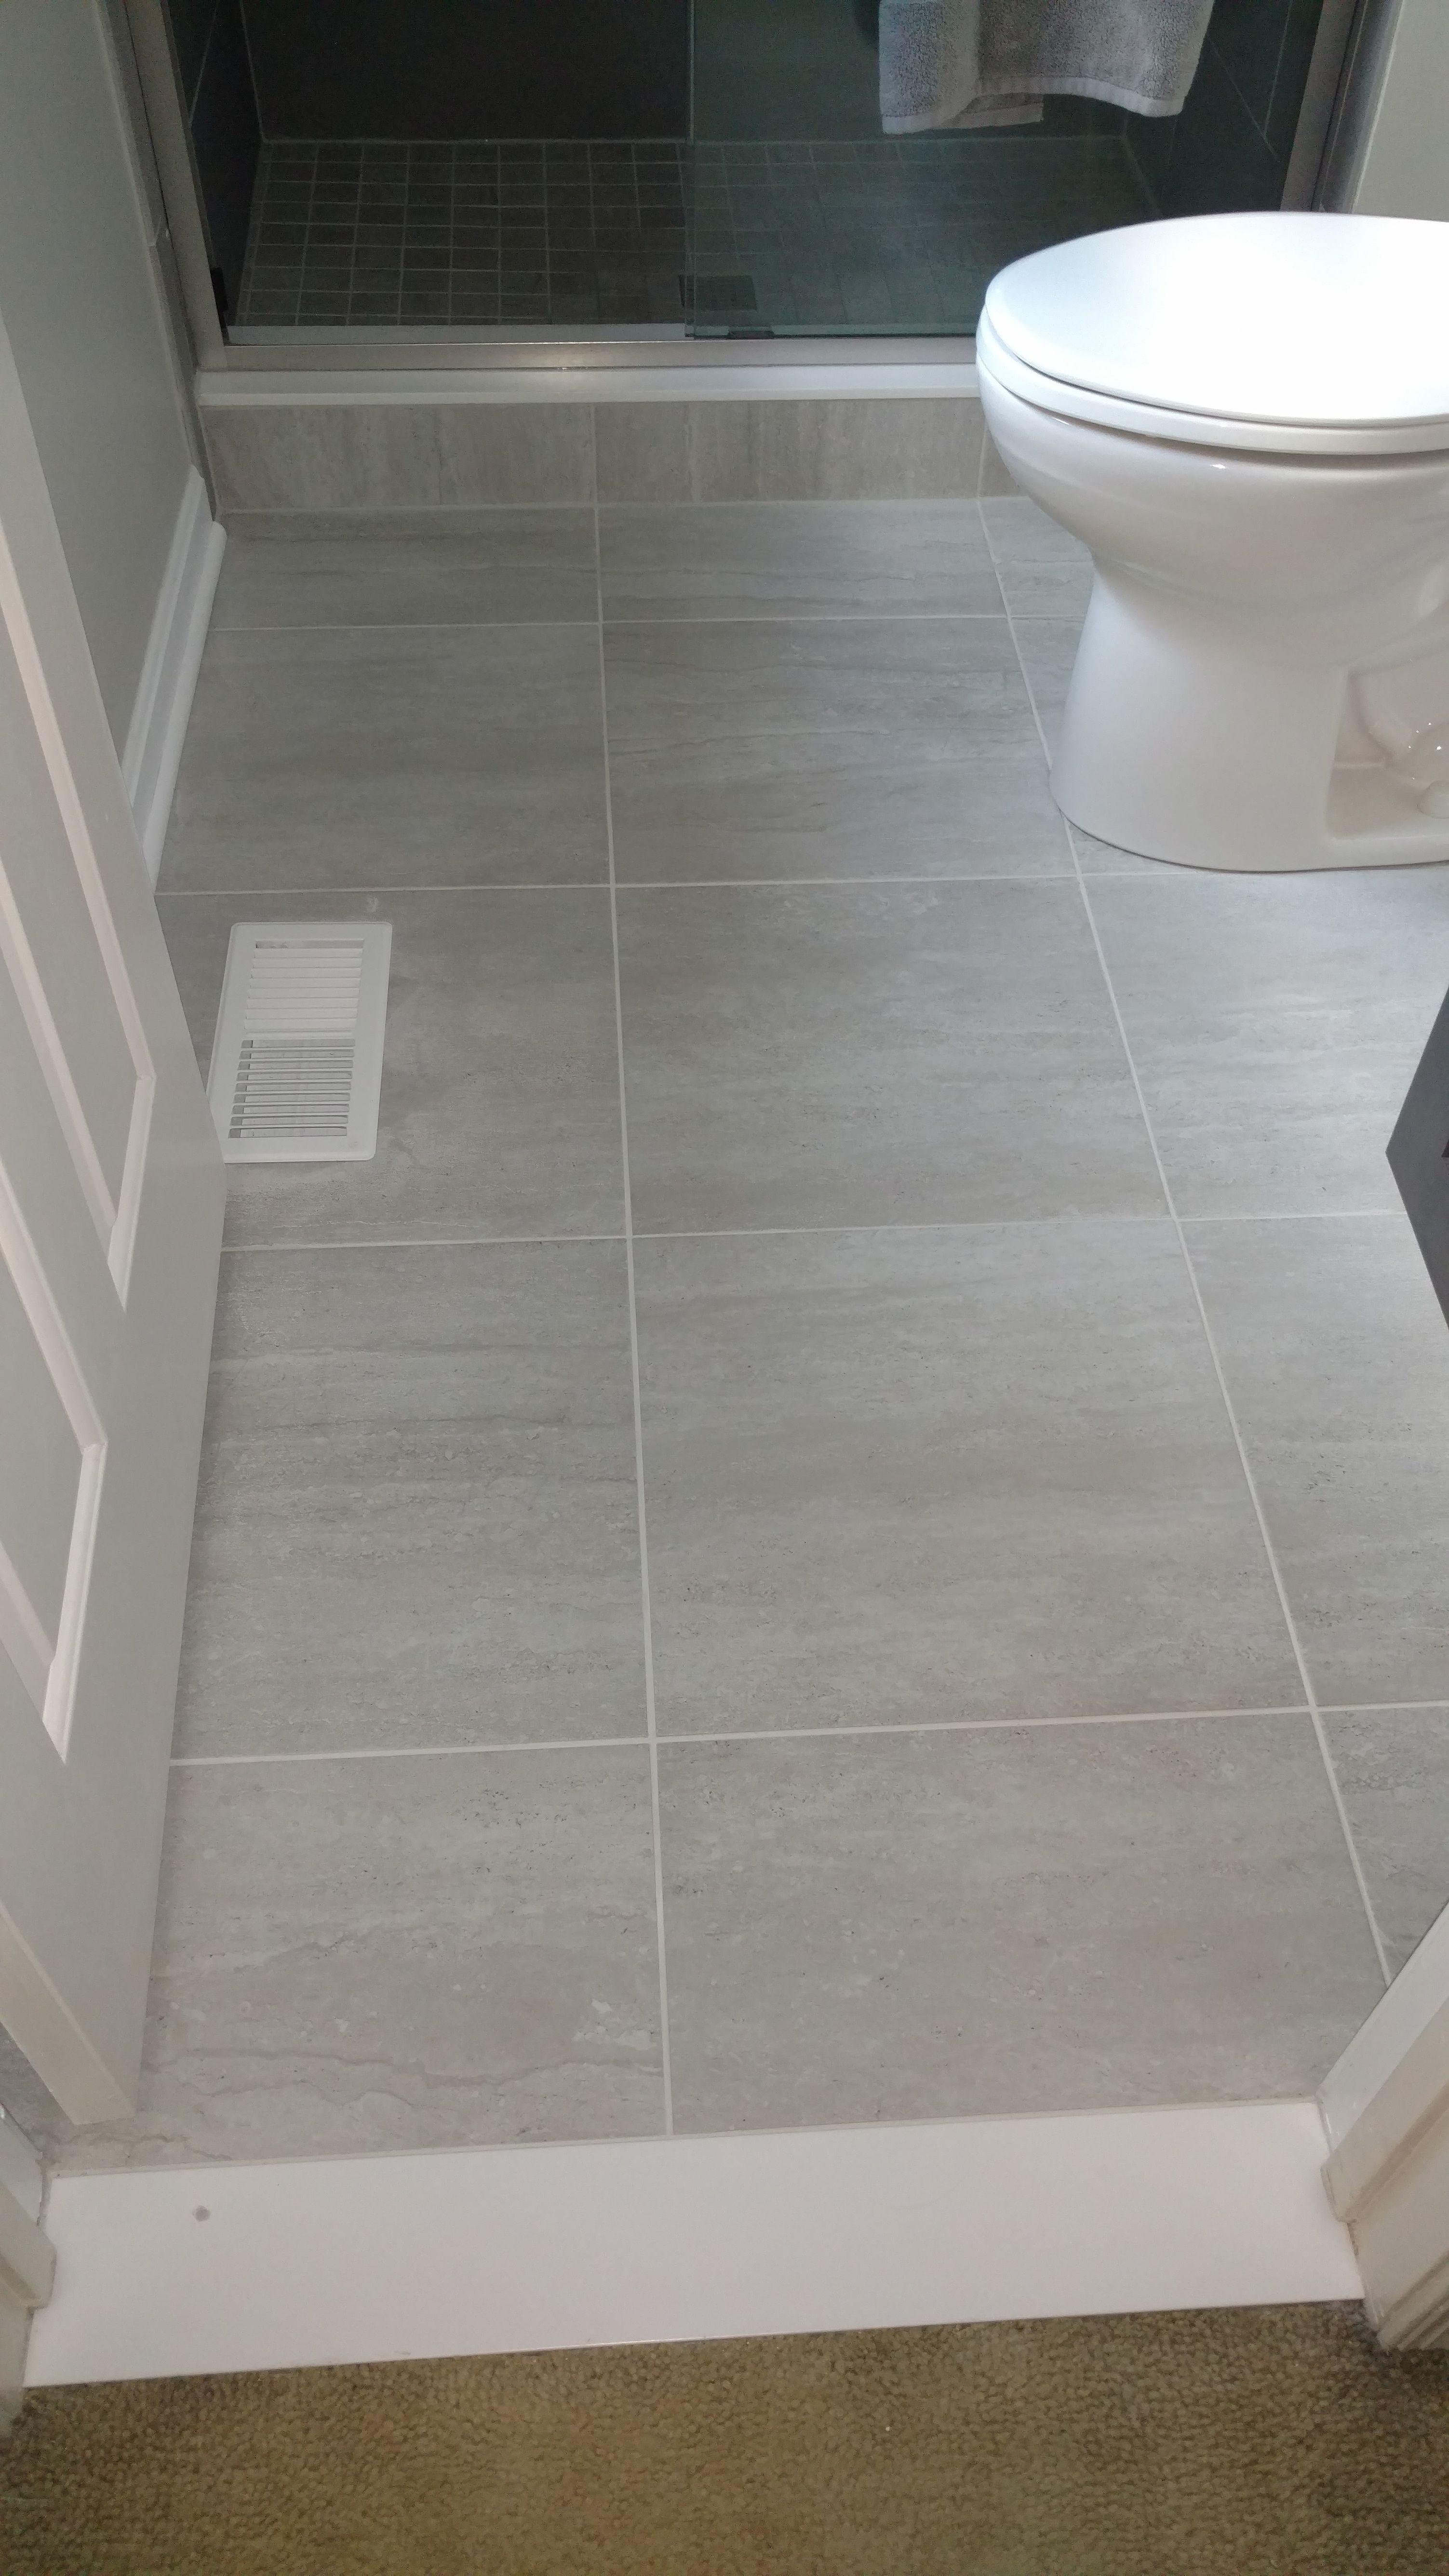 Pin By Bath Kitchen Tile Center On Master Bathroom Bel Air Md Bathroom Renos Master Bathroom Bathroom Interior